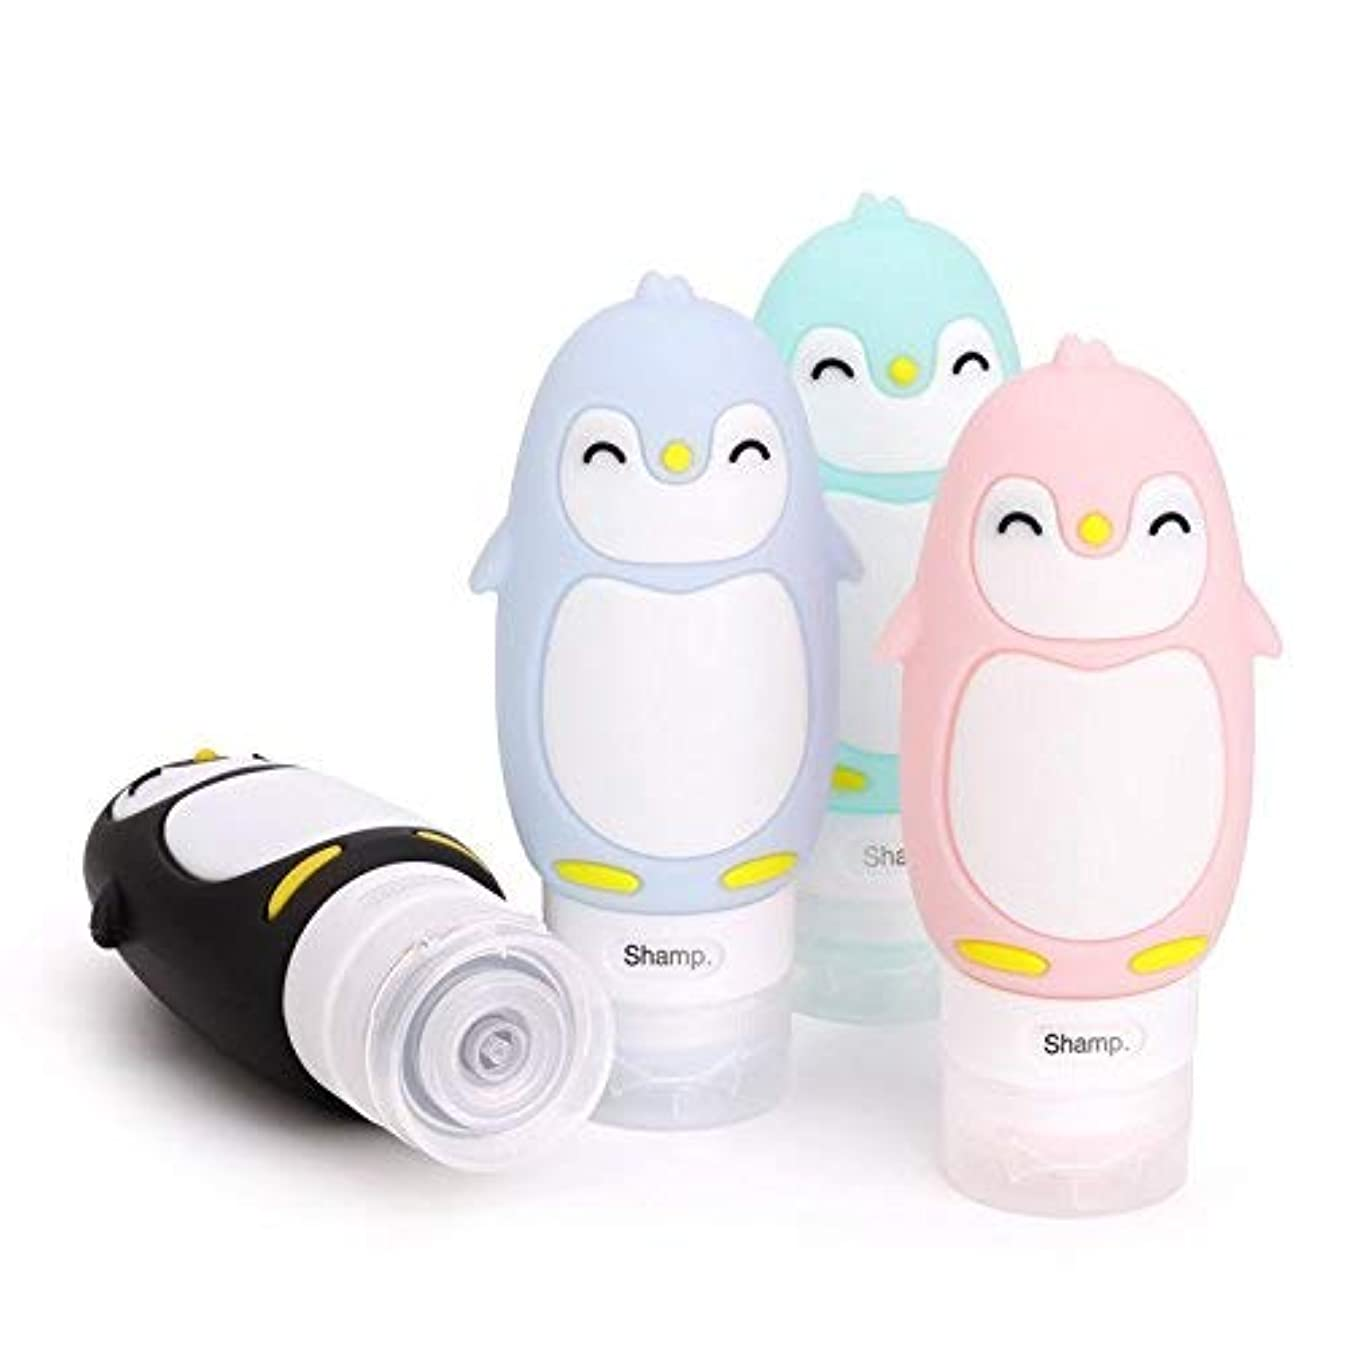 Kinbo 4パックポータブルトラベルボトルリーク防止、3ozリフィル可能なソフトシリコンスキージリキッドトイレタリーコンテナ、シャンプーローションソープ化粧品